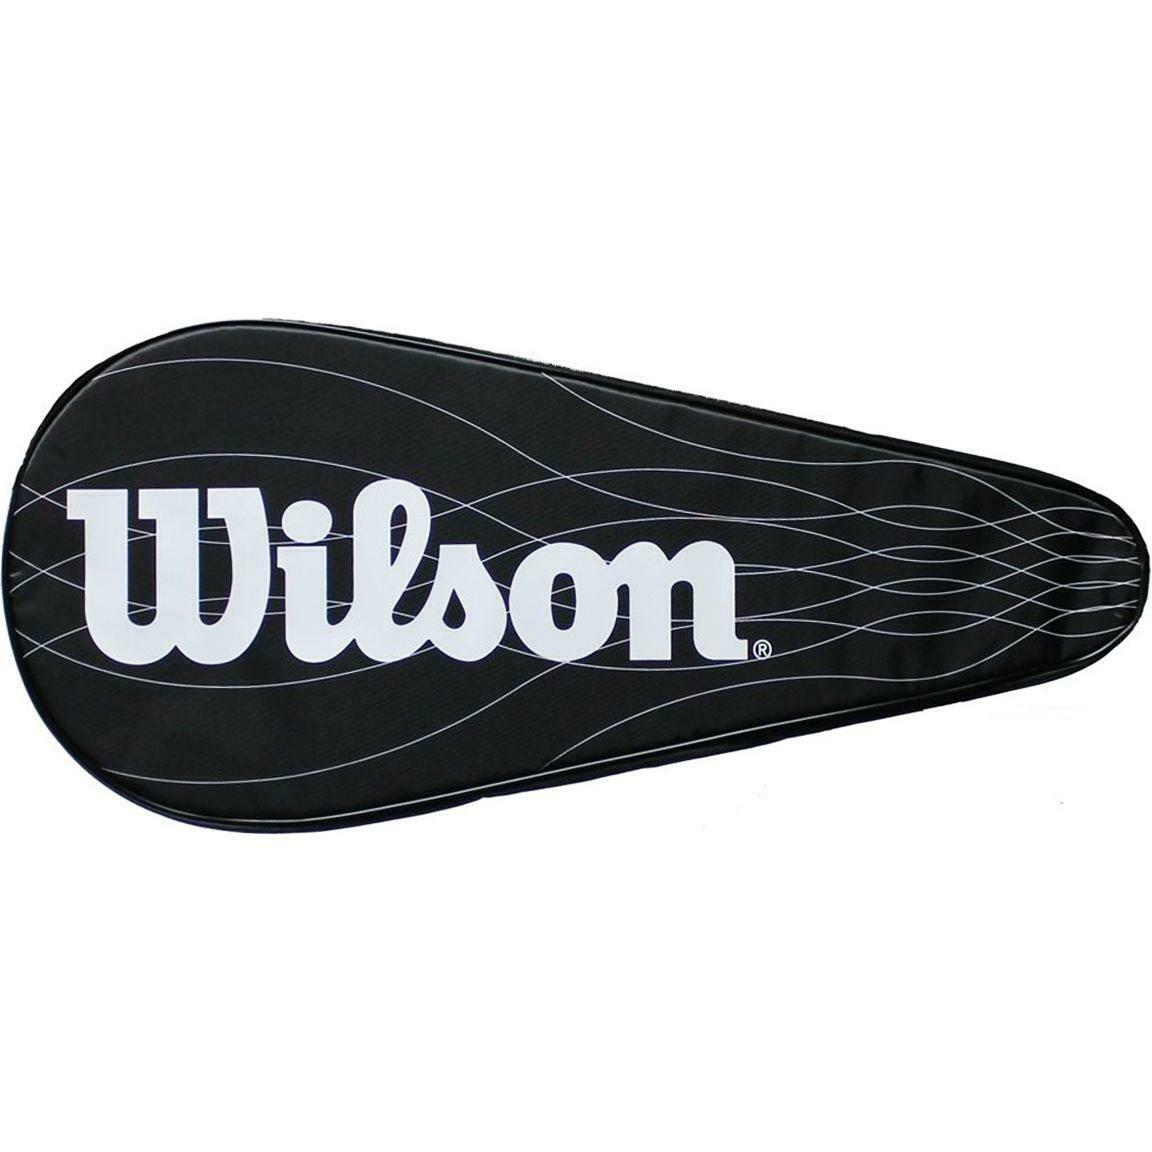 Wilson Performance Tennis Racket Cover - Black